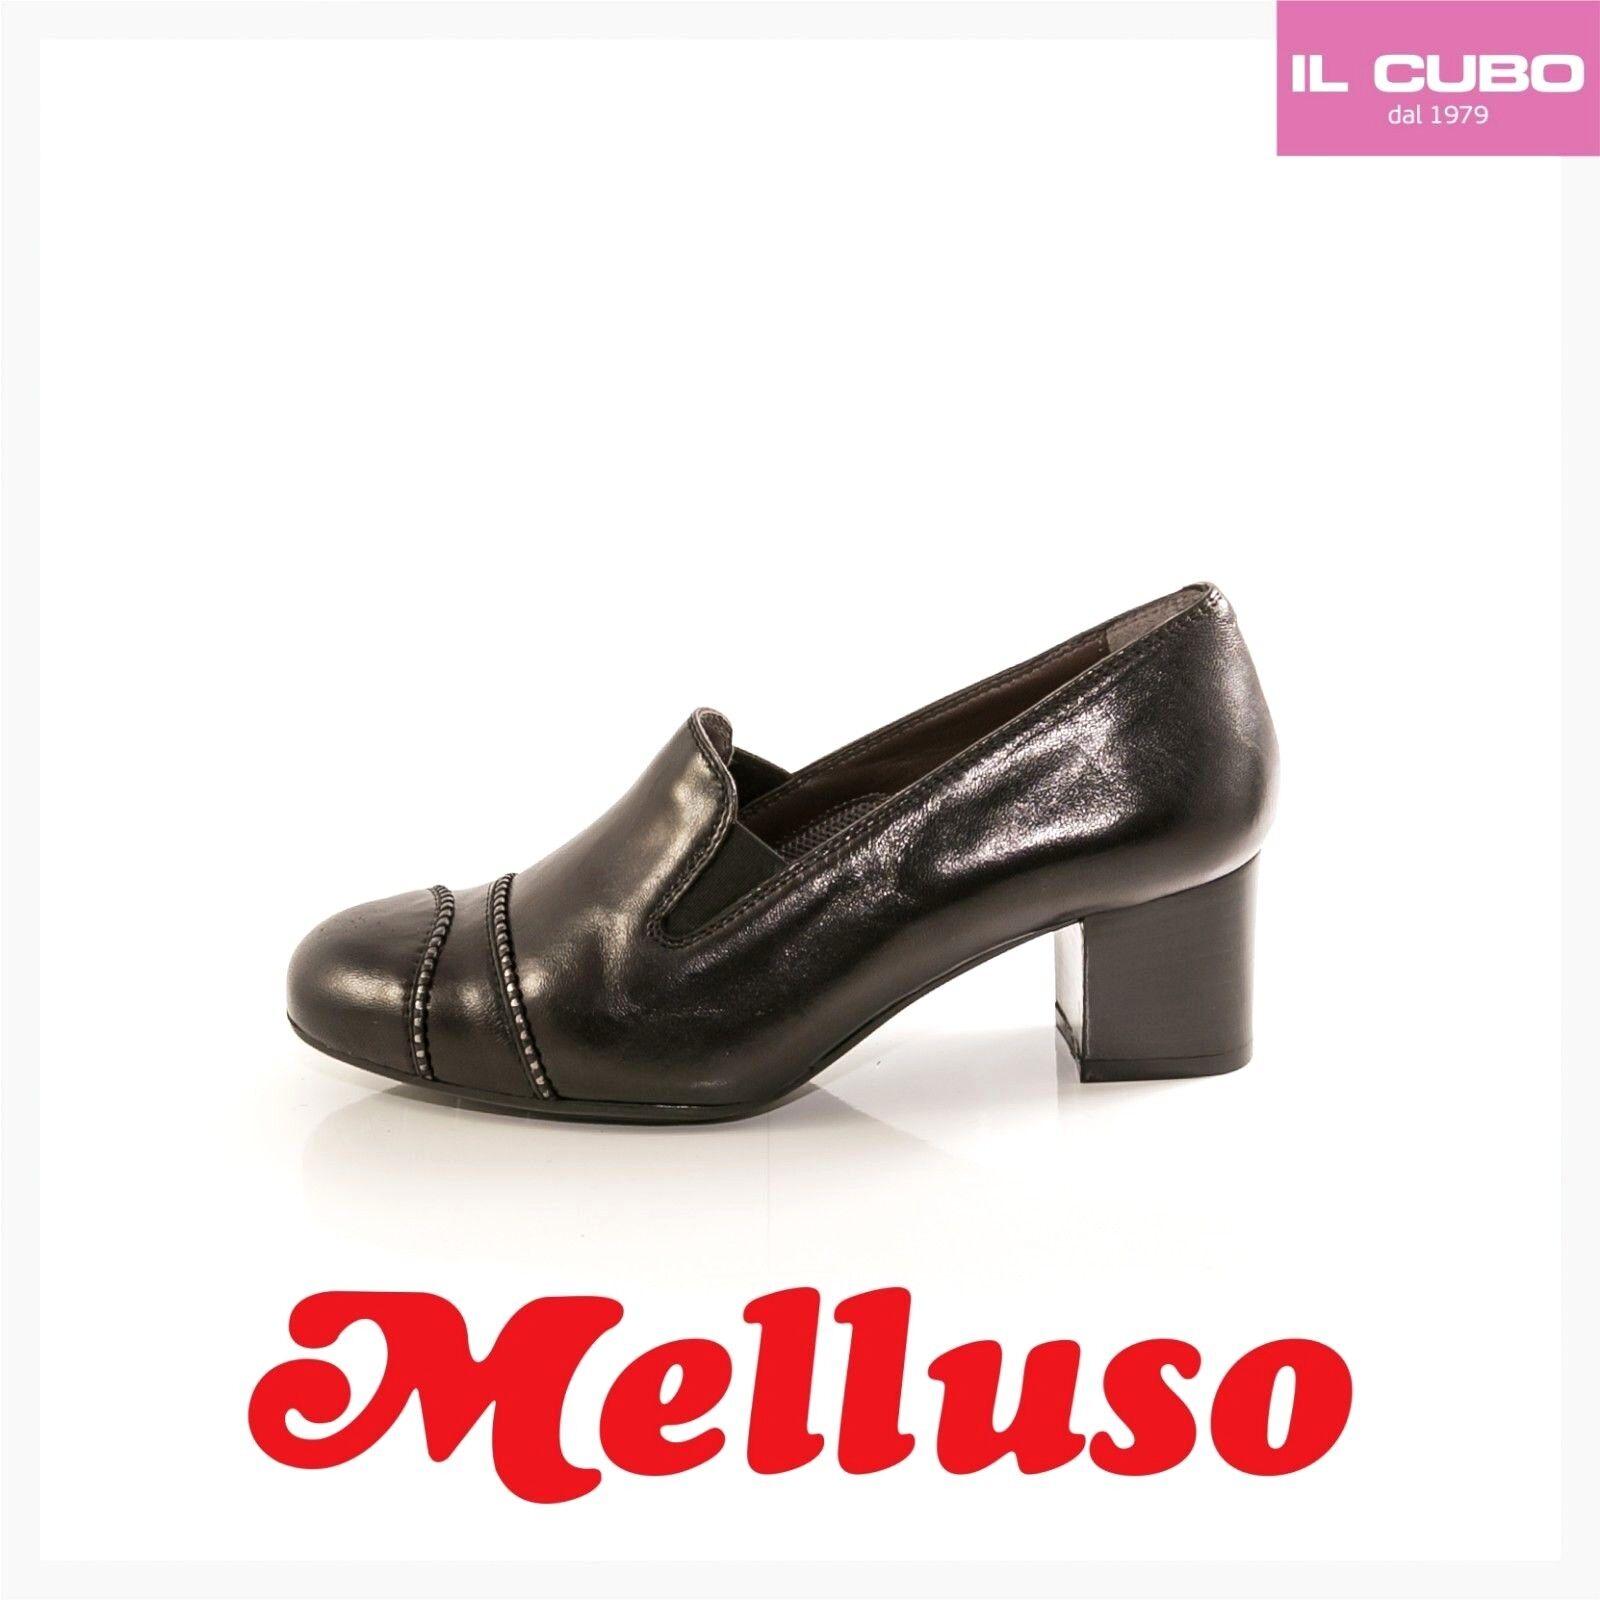 MELLUSO SCARPA women MOCASSINO PELLE color black TACCO H 5,5 CM MADE IN ITALY